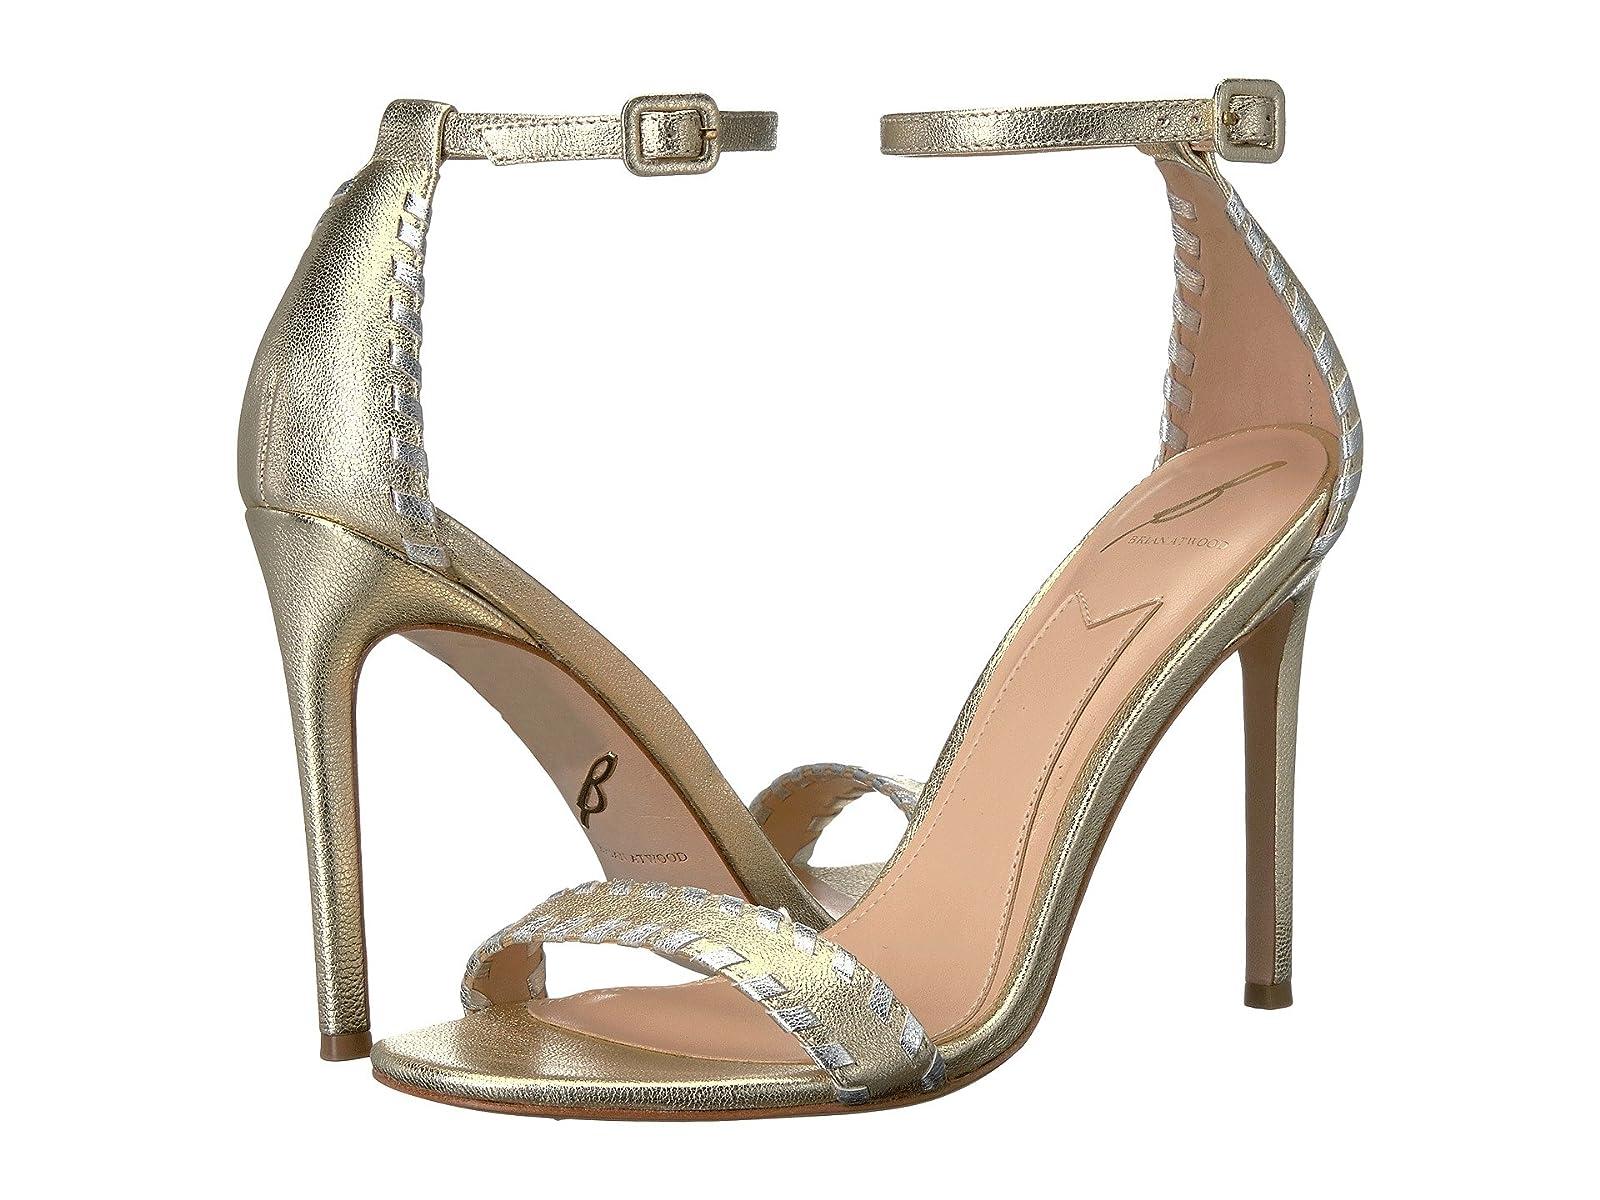 B Brian Atwood FenixCheap and distinctive eye-catching shoes